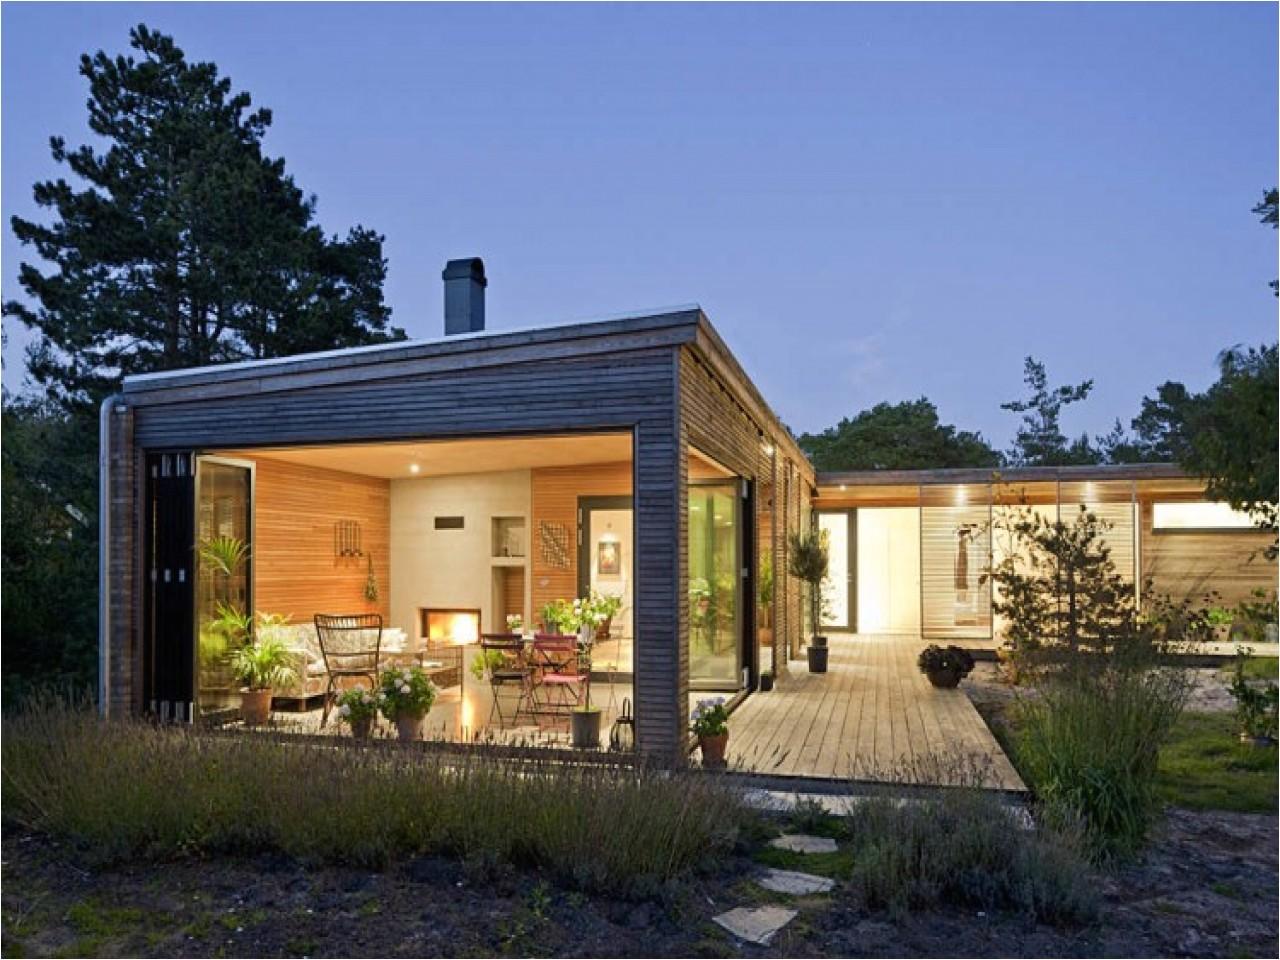 5c7a611ecdb84e17 modern small house plans small contemporary home modern house